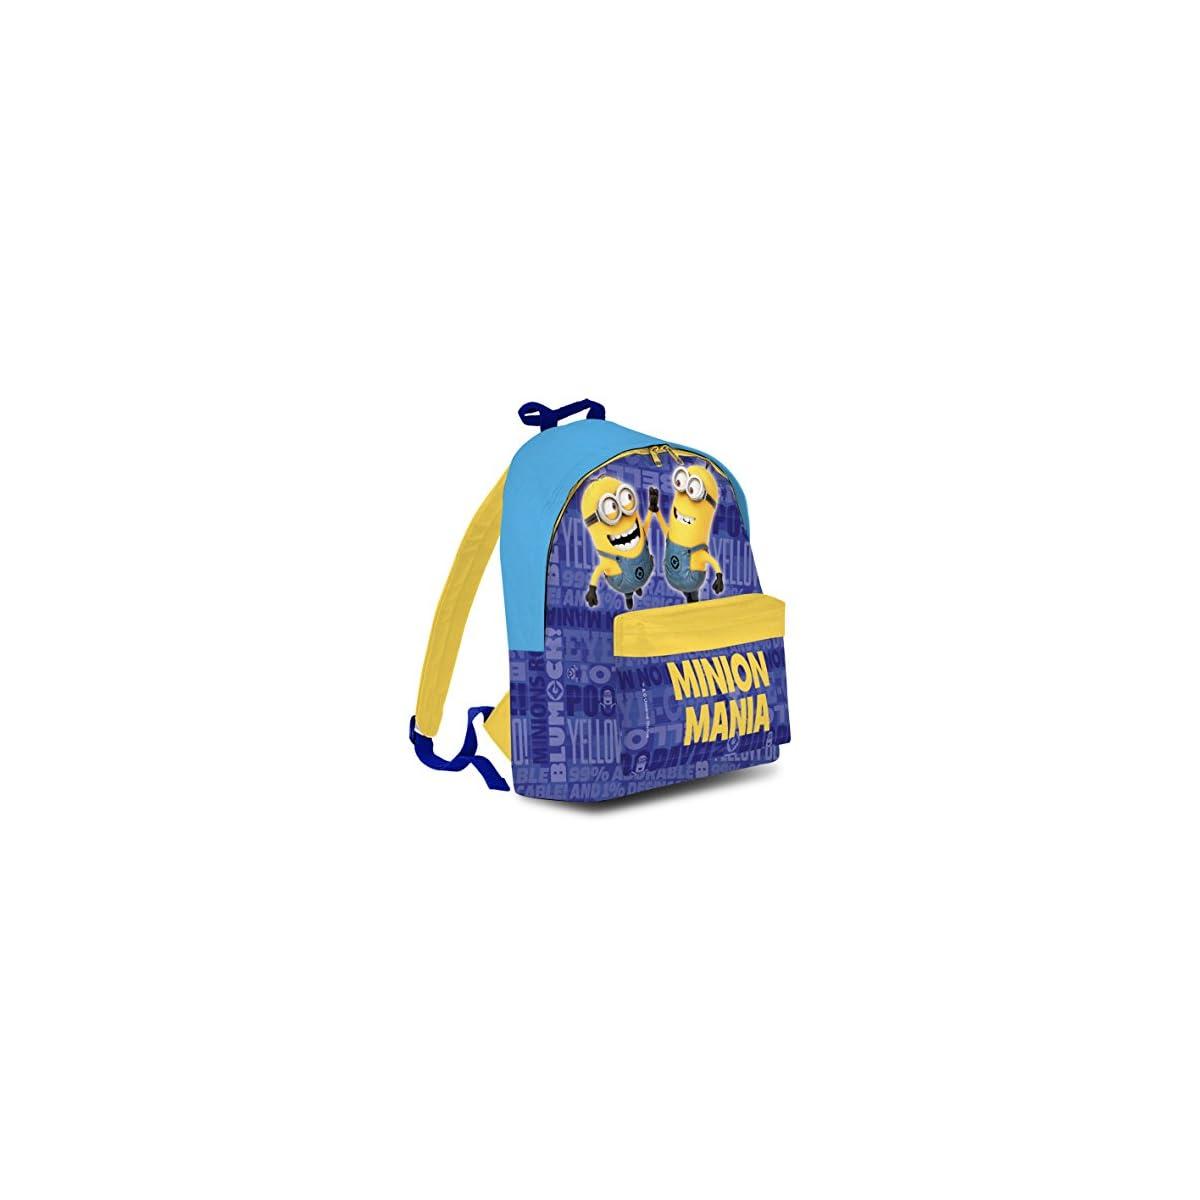 51OyXqUDmVL. SS1200  - BAKAJI Zaino Americano Minions Cattivissimo Me Mochila Infantil 40 Centimeters Azul (BLU)